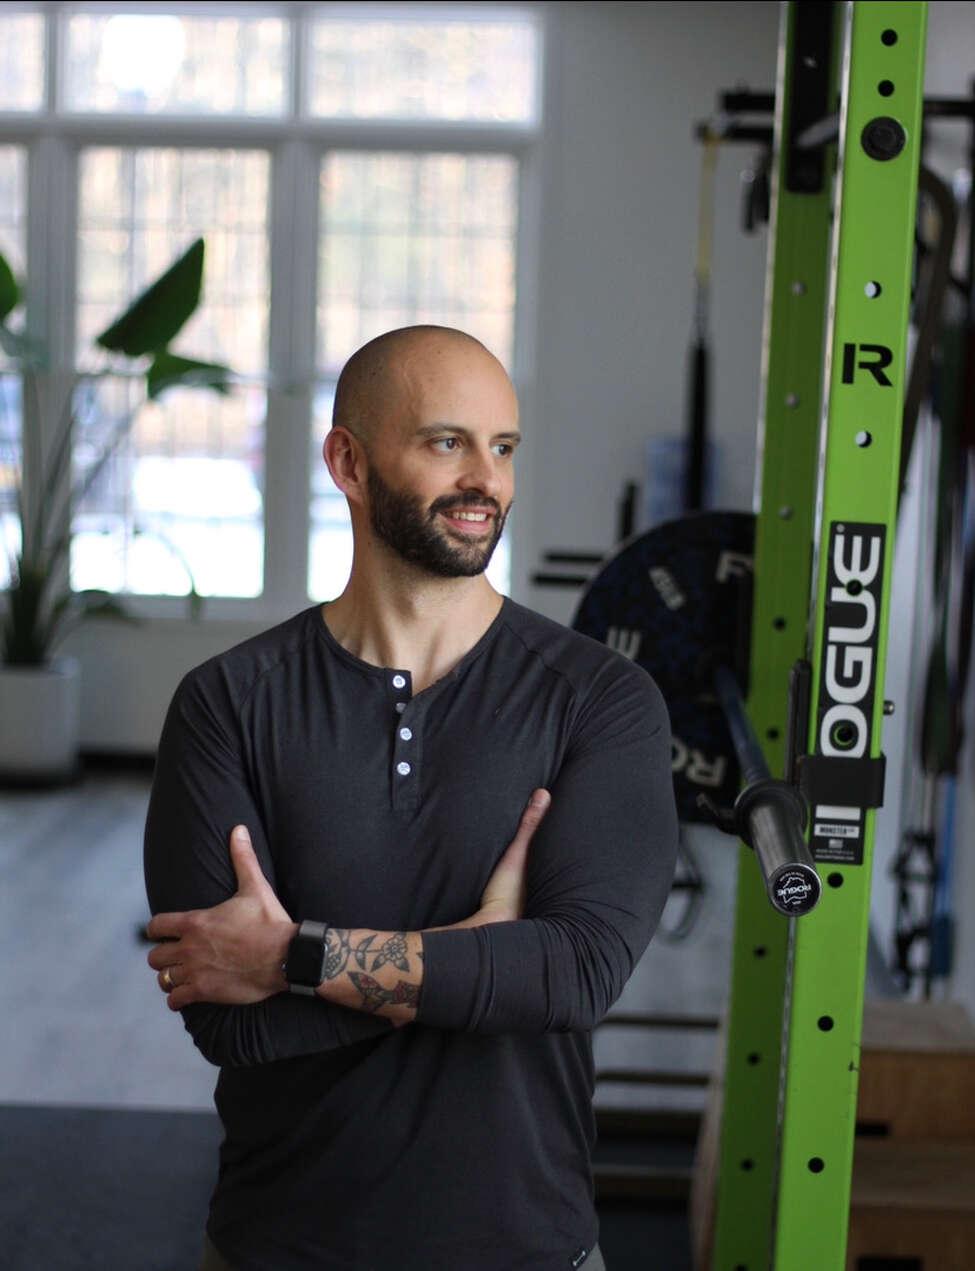 Personal trainer Will Yund